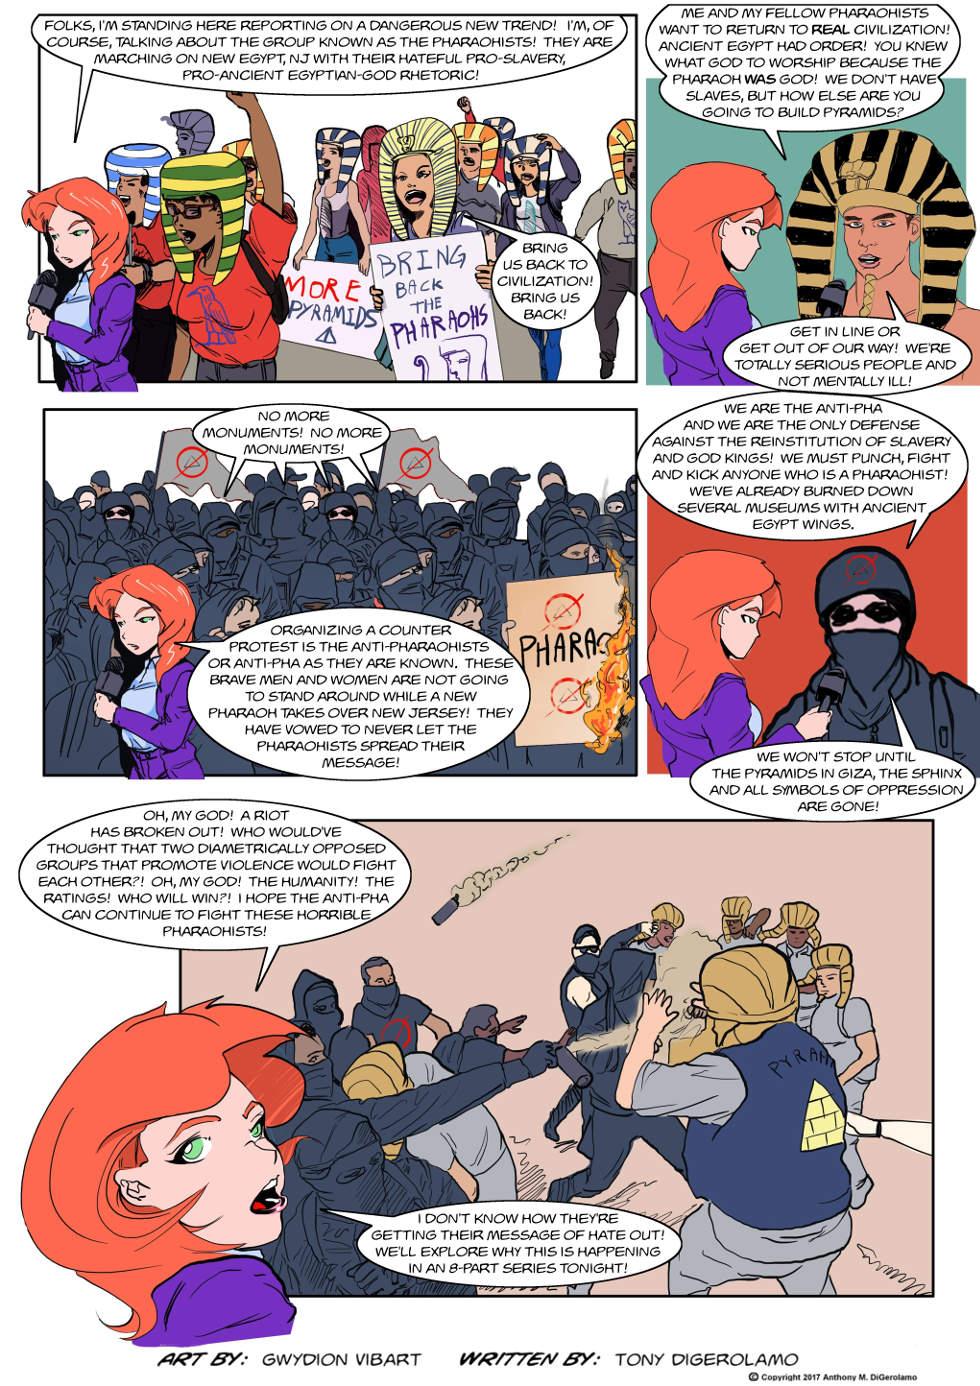 The Antiwar Comic:  Don't Be a Pharaohist!